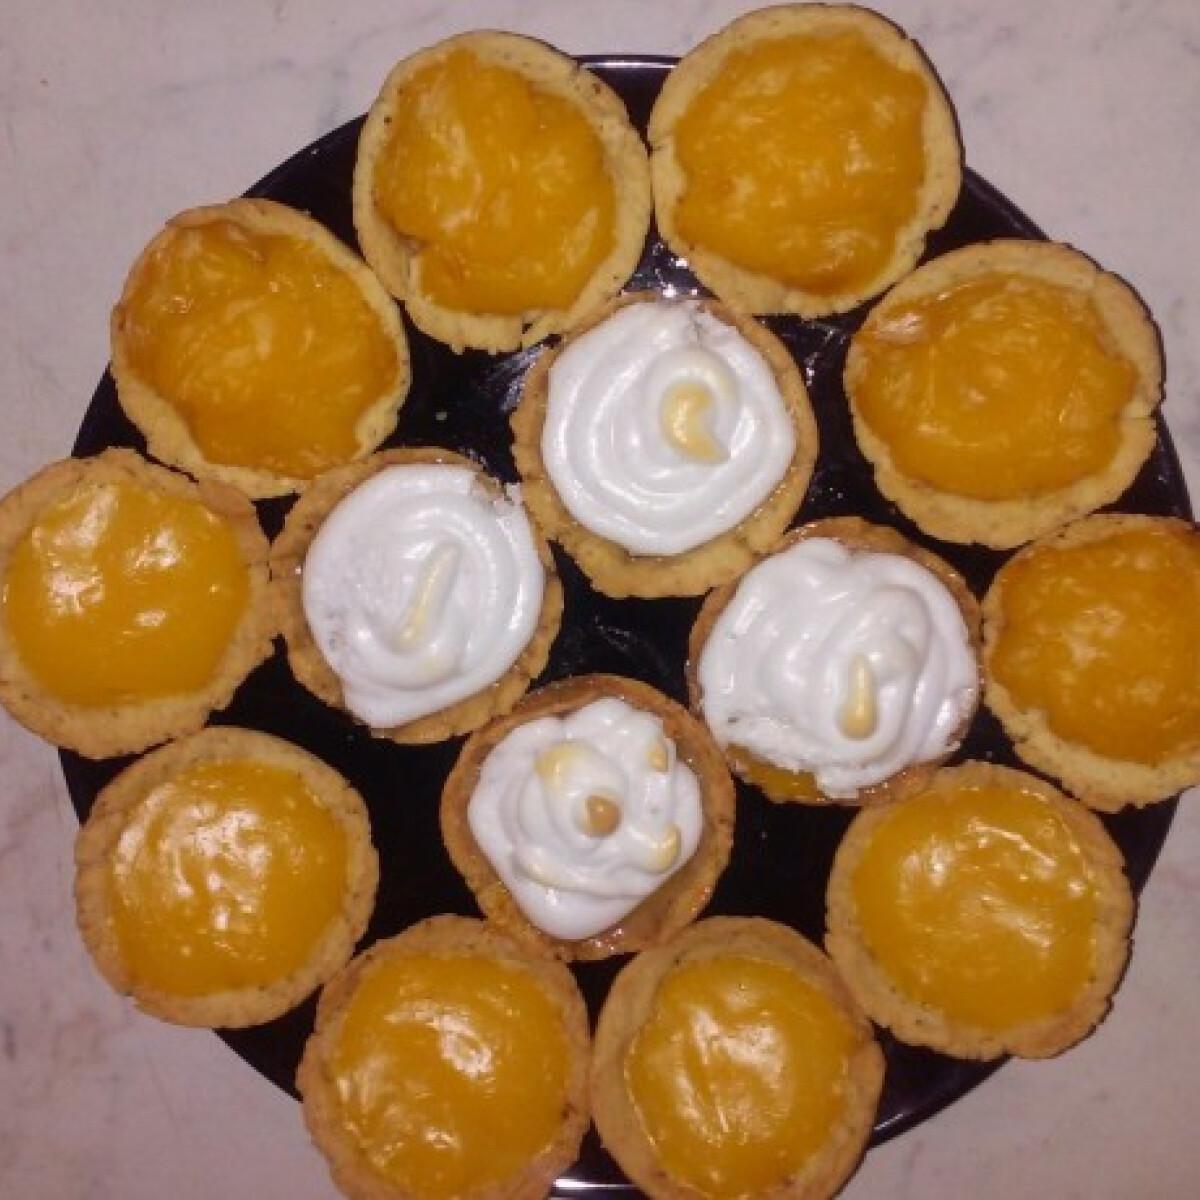 Ezen a képen: Narancskrémes muffin